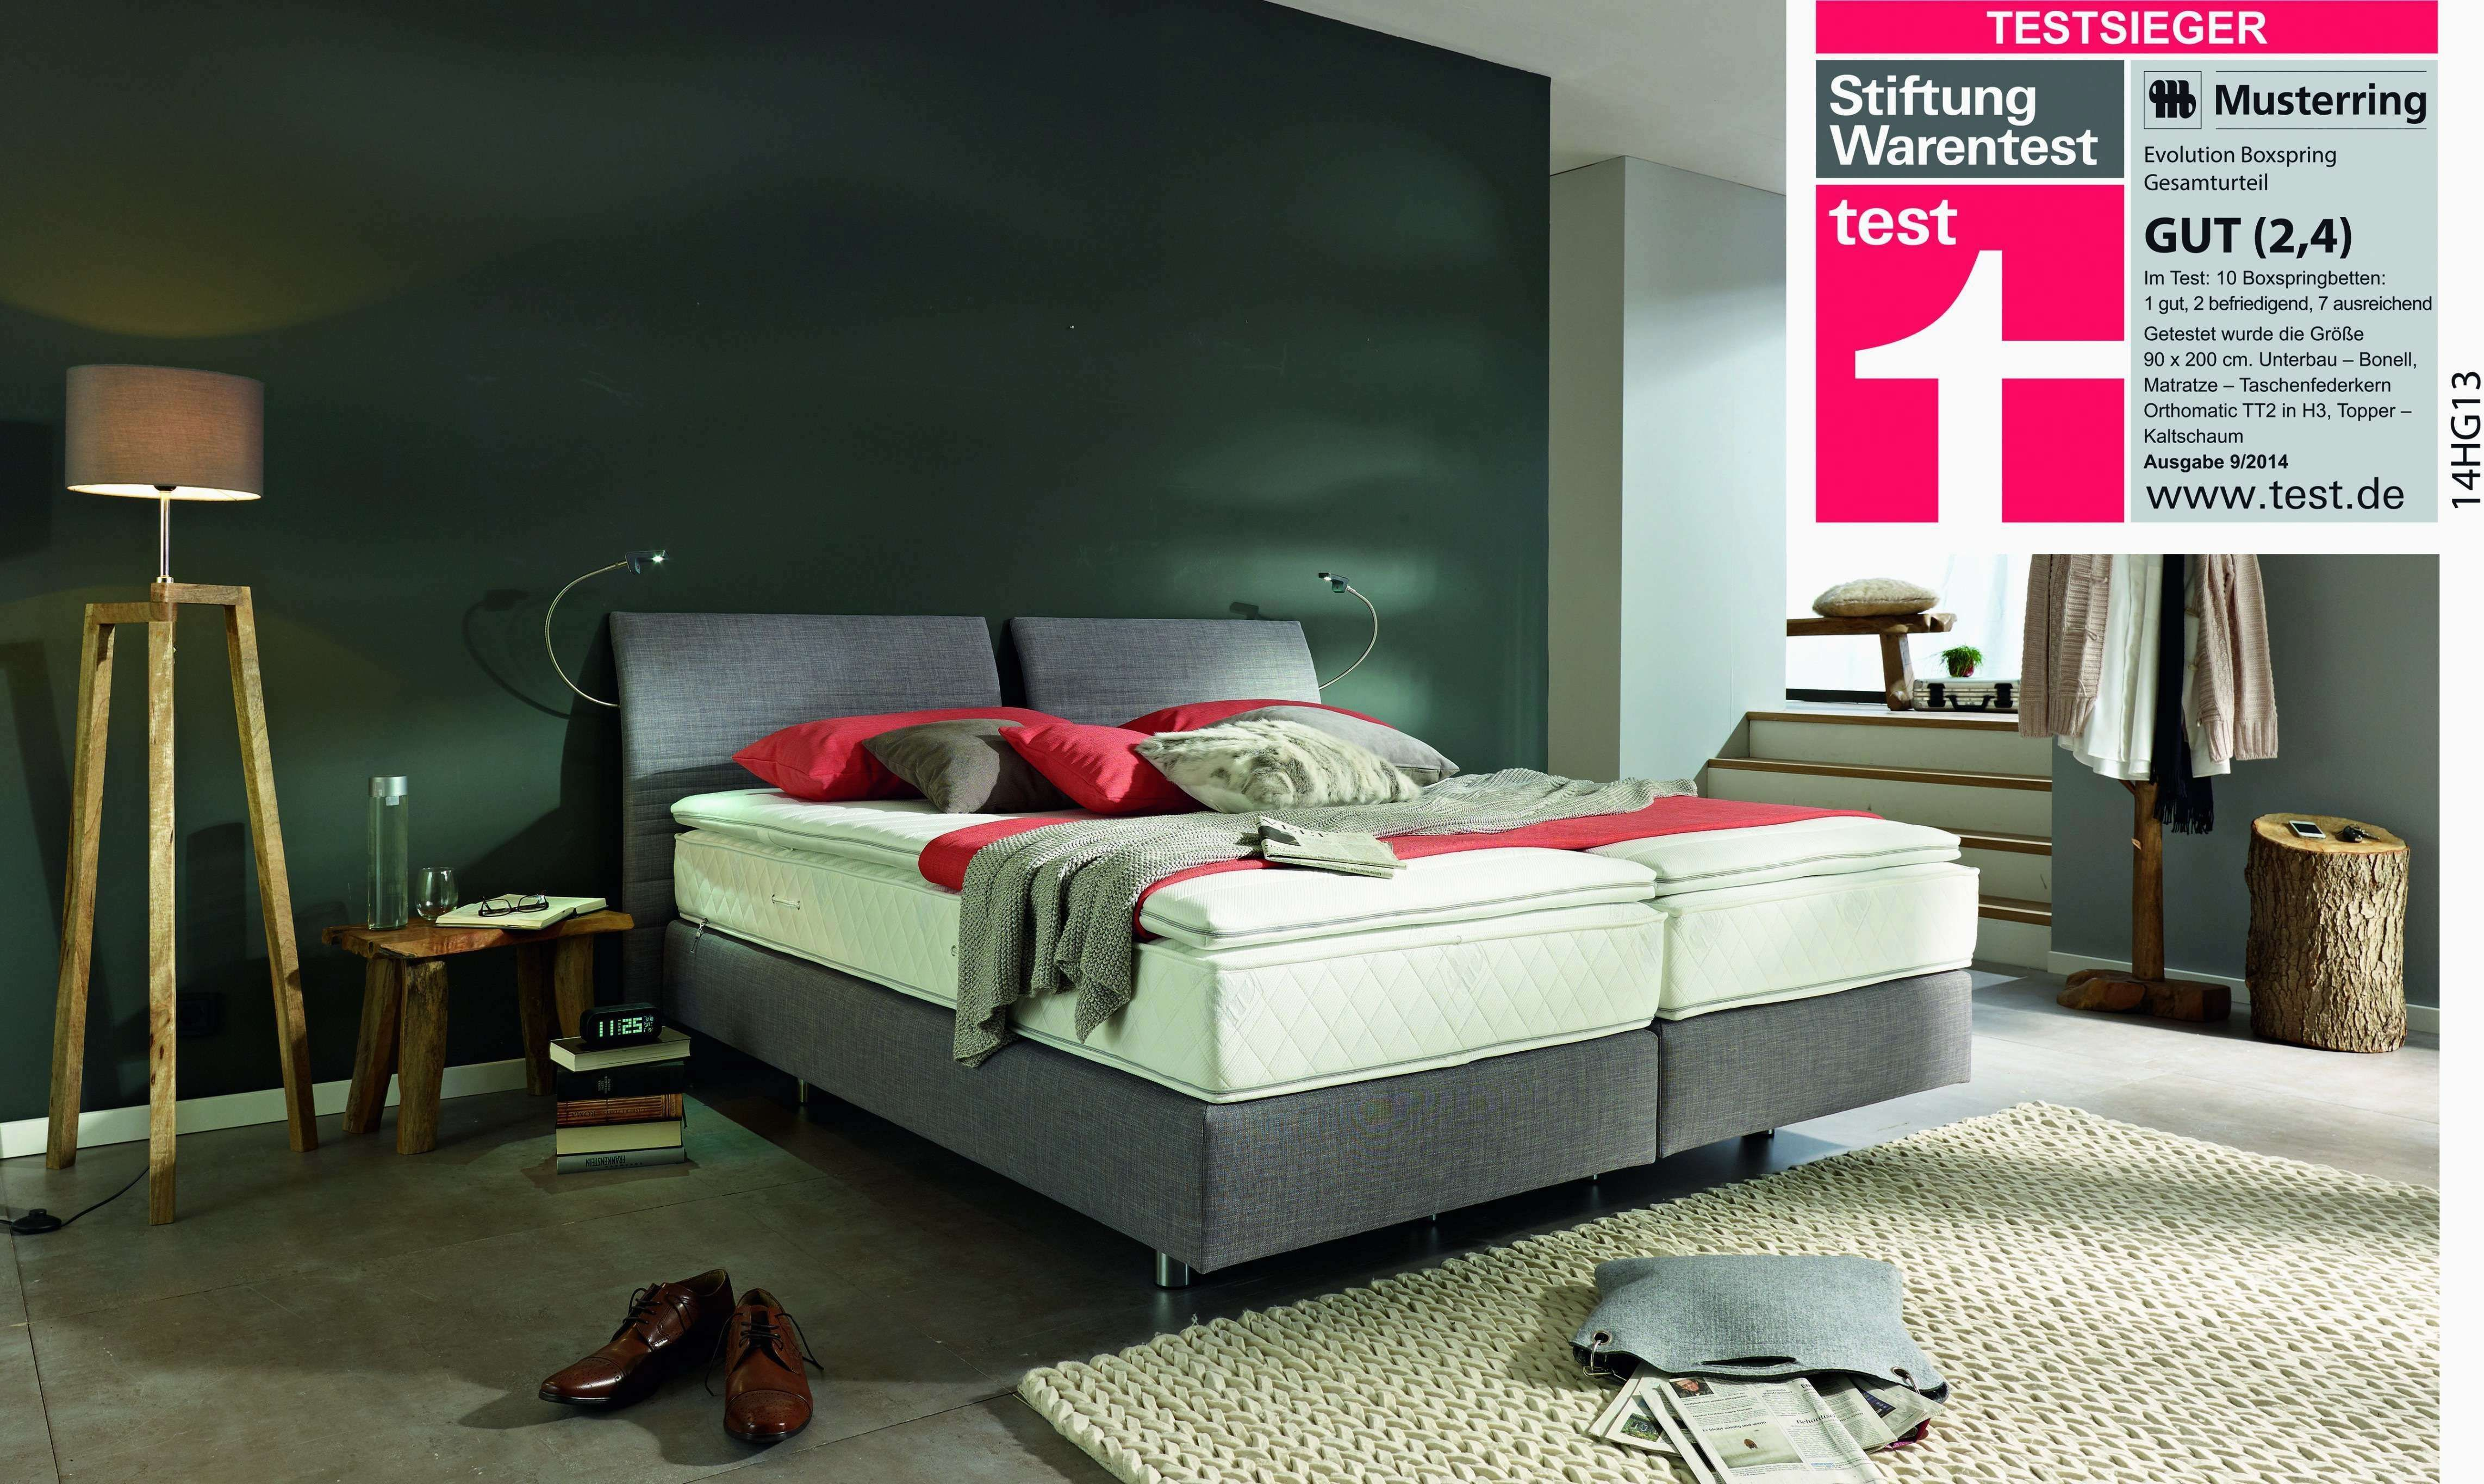 Home 24 Betten 24 Goede Boxspring 120x200 Ikea Aidapp In 2020 Sofa Design Parisian Decor Decor